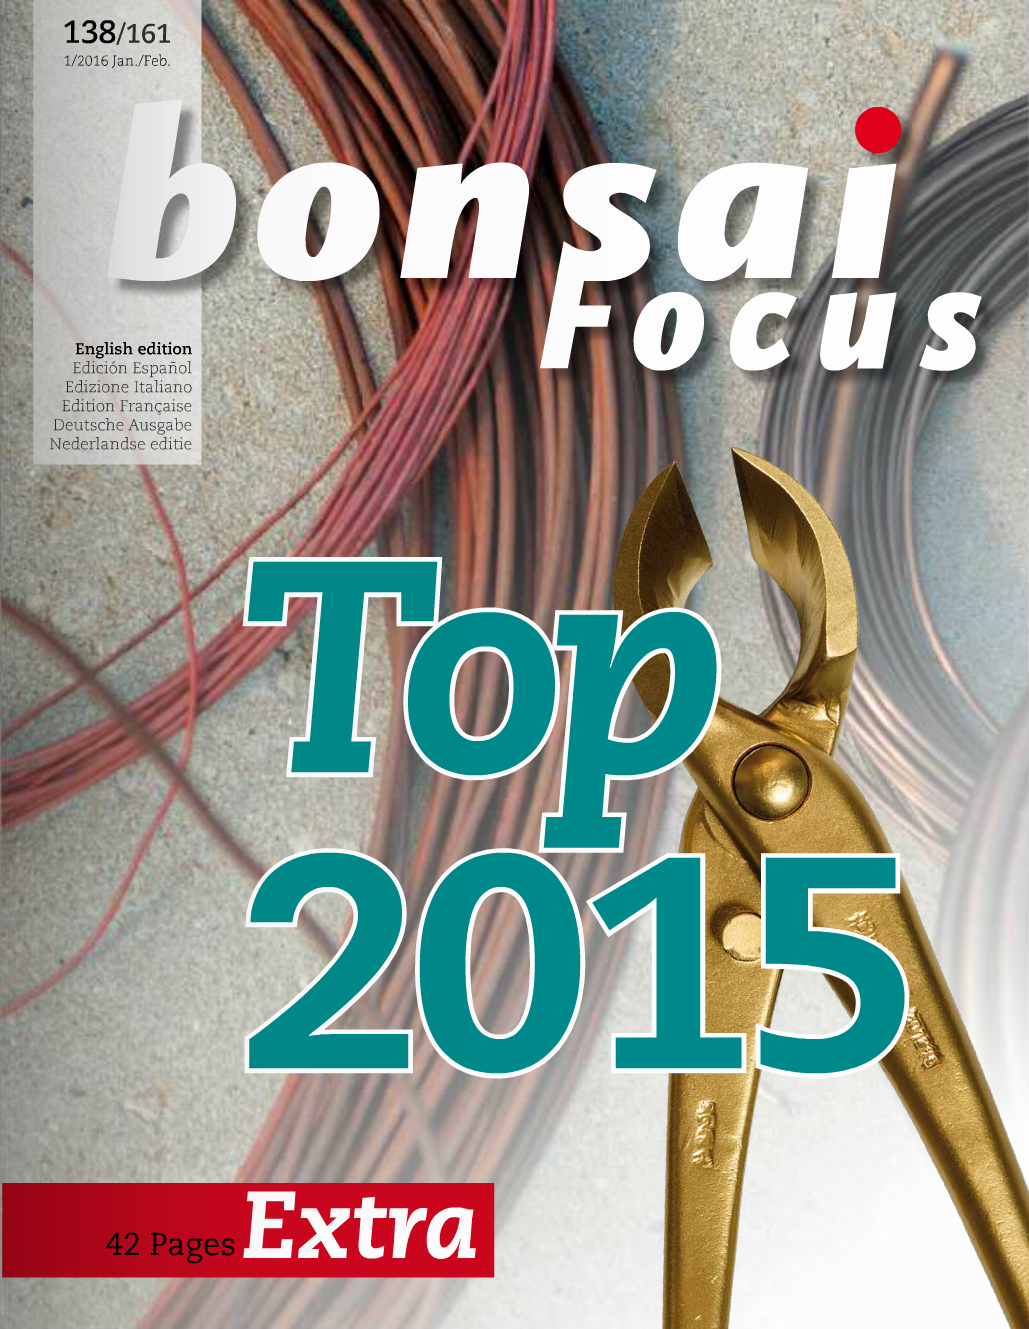 Bonsai_Focus_Cover.png